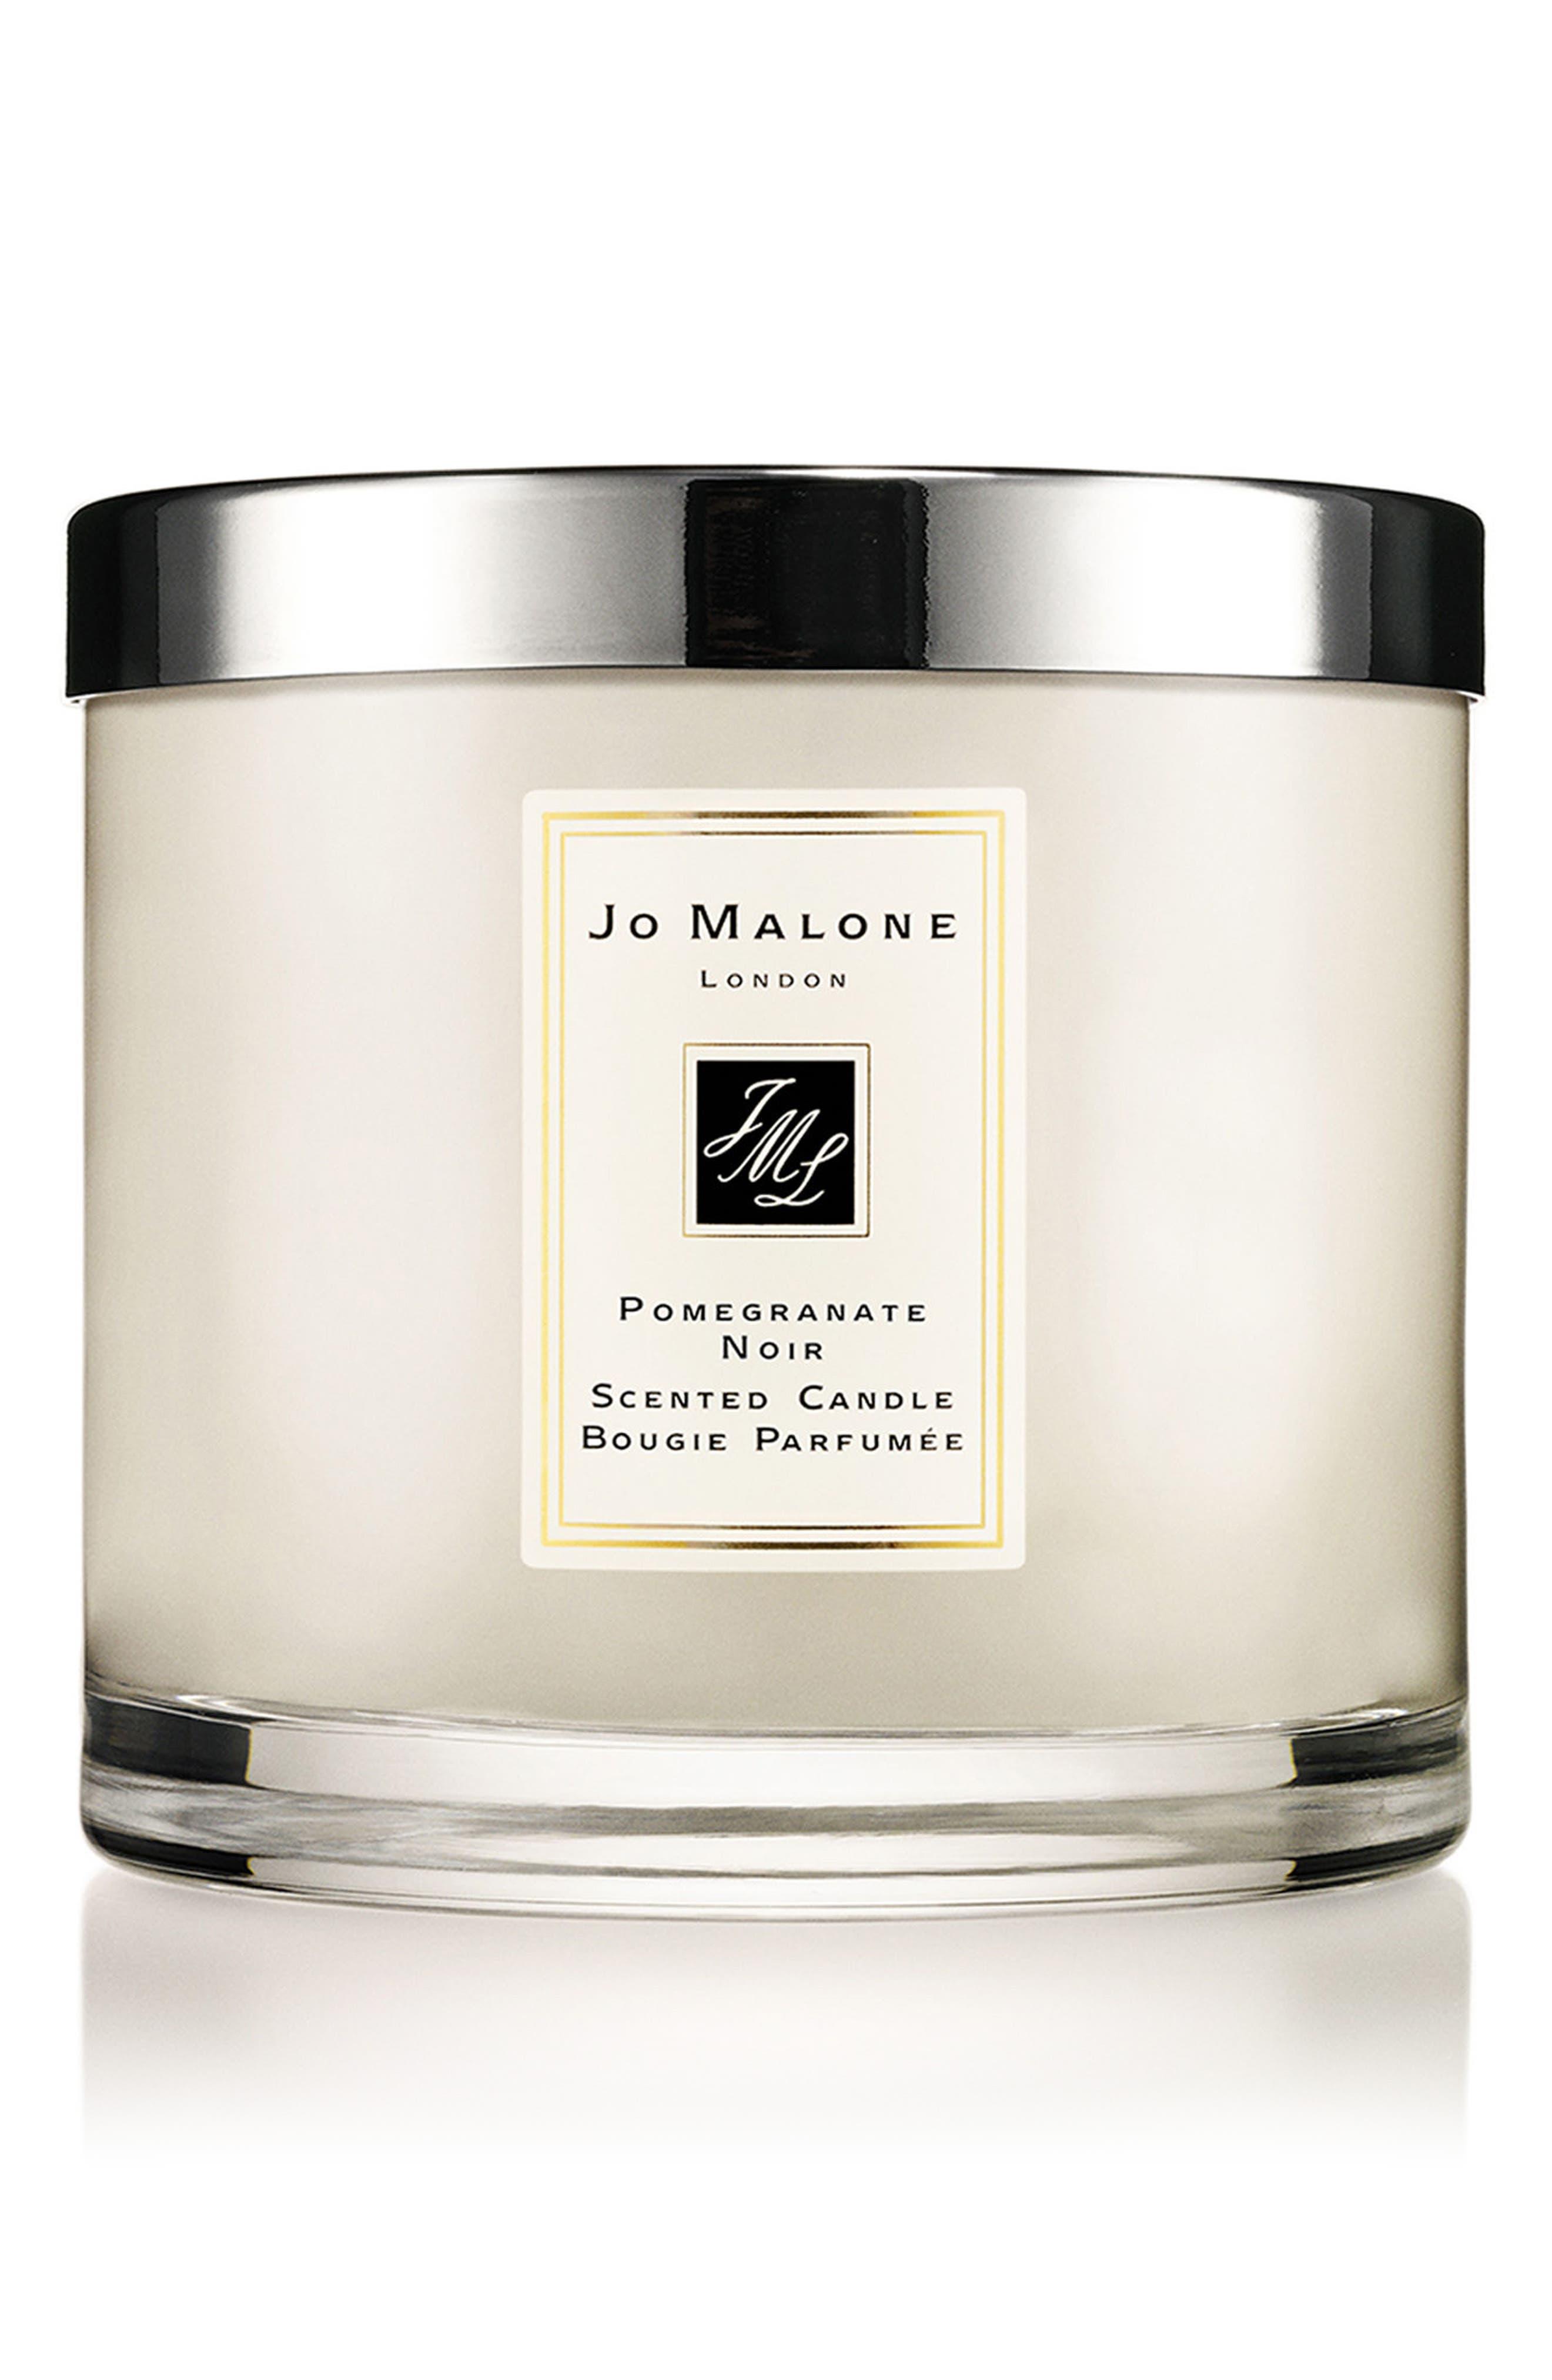 Jo Malone™ 'Pomegranate Noir' Luxury Candle